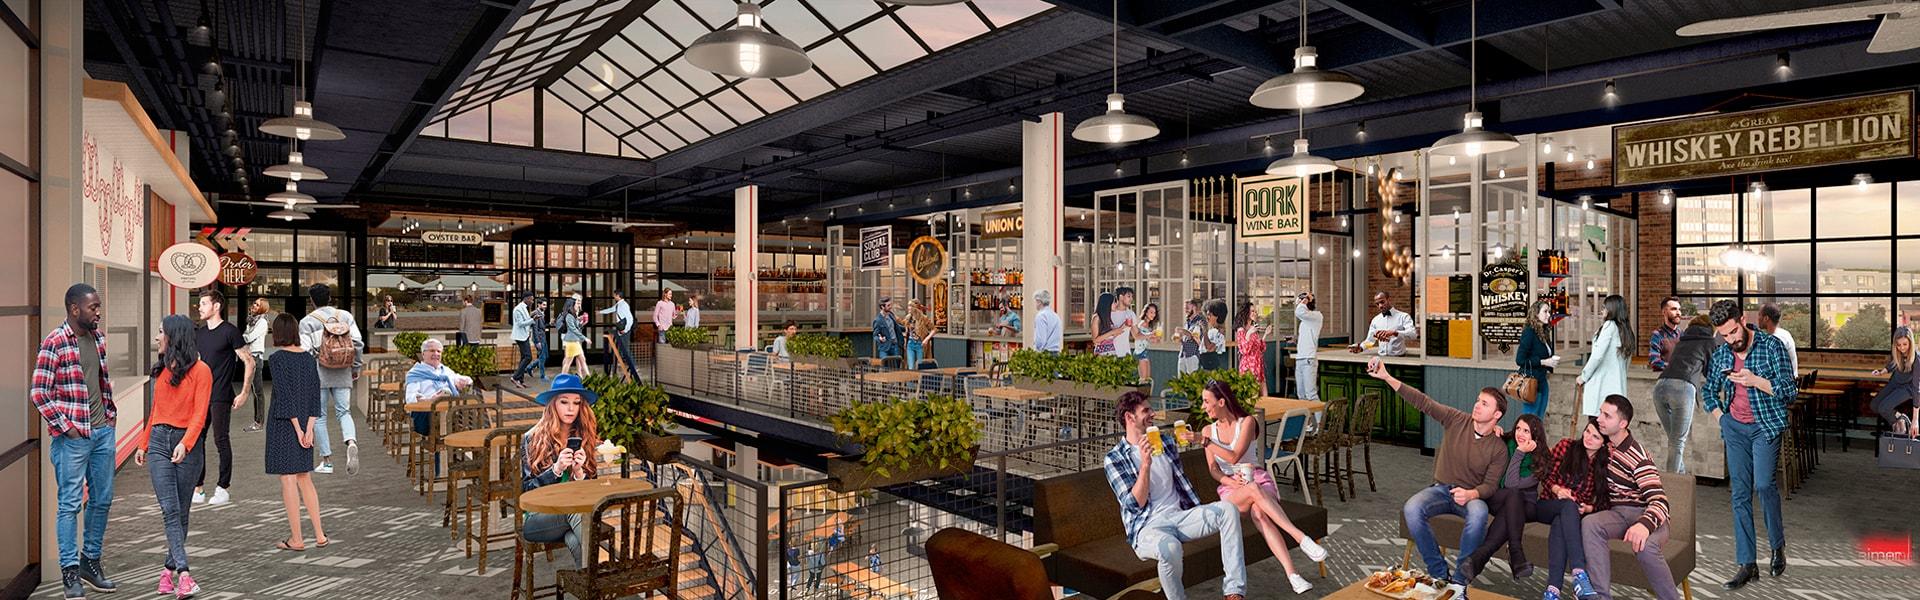 Beer and Food Hall | Rock Row